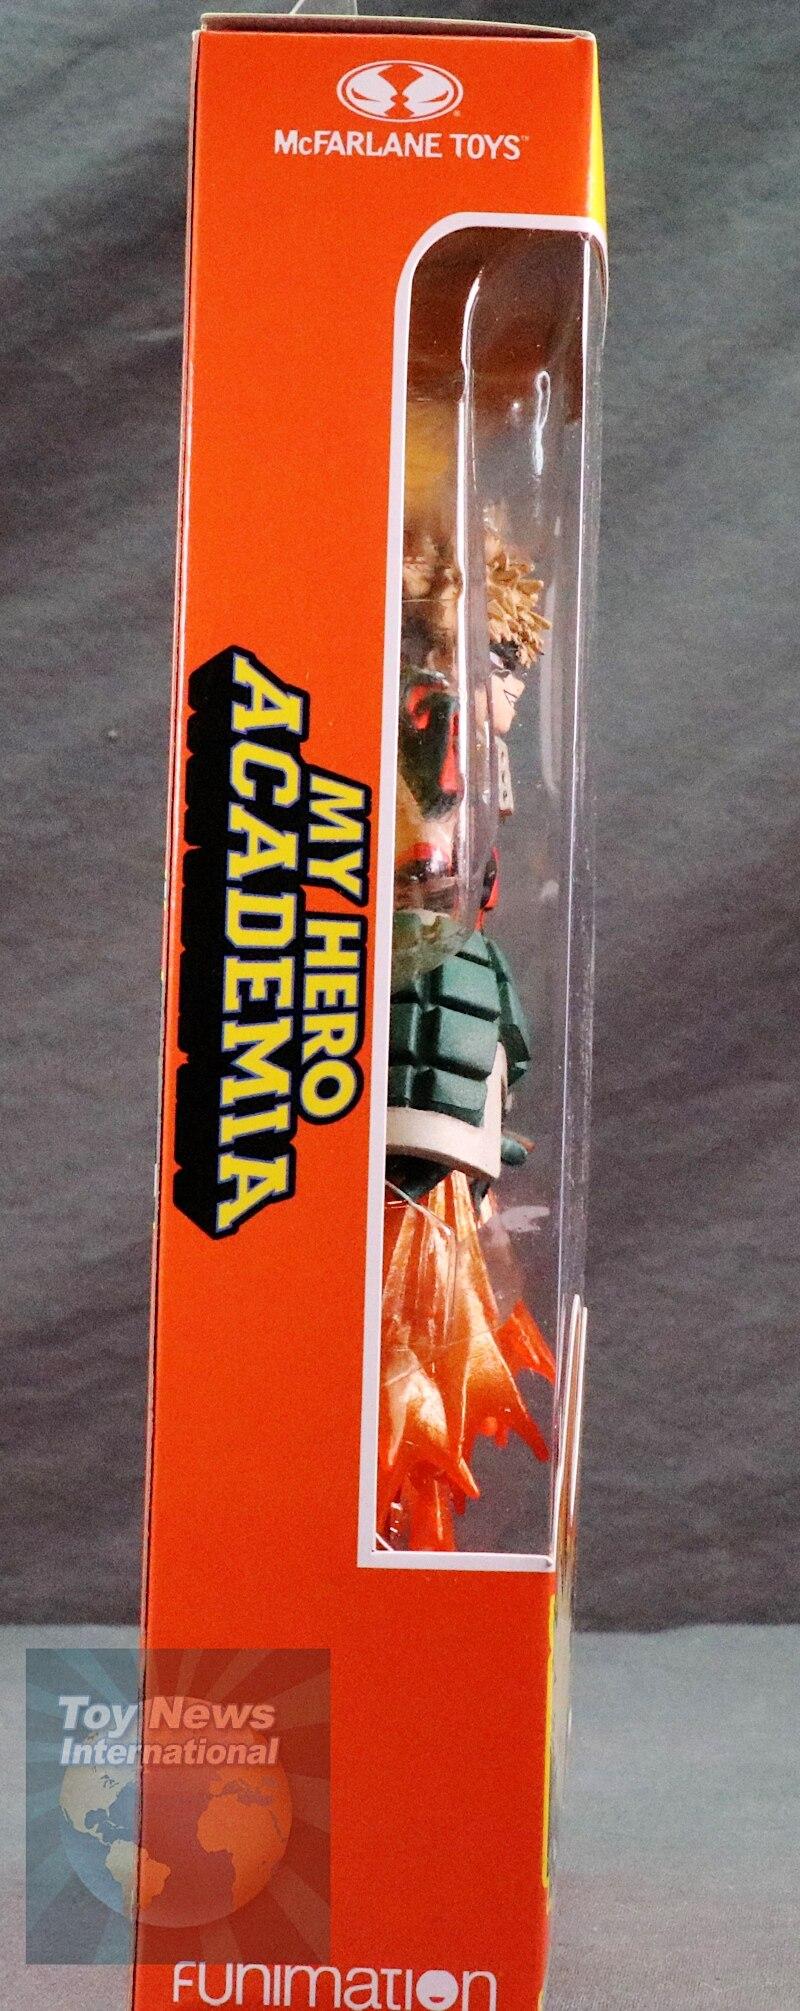 My Hero Academia Mcfarlane Toys Katsuki Bakugo And All Might